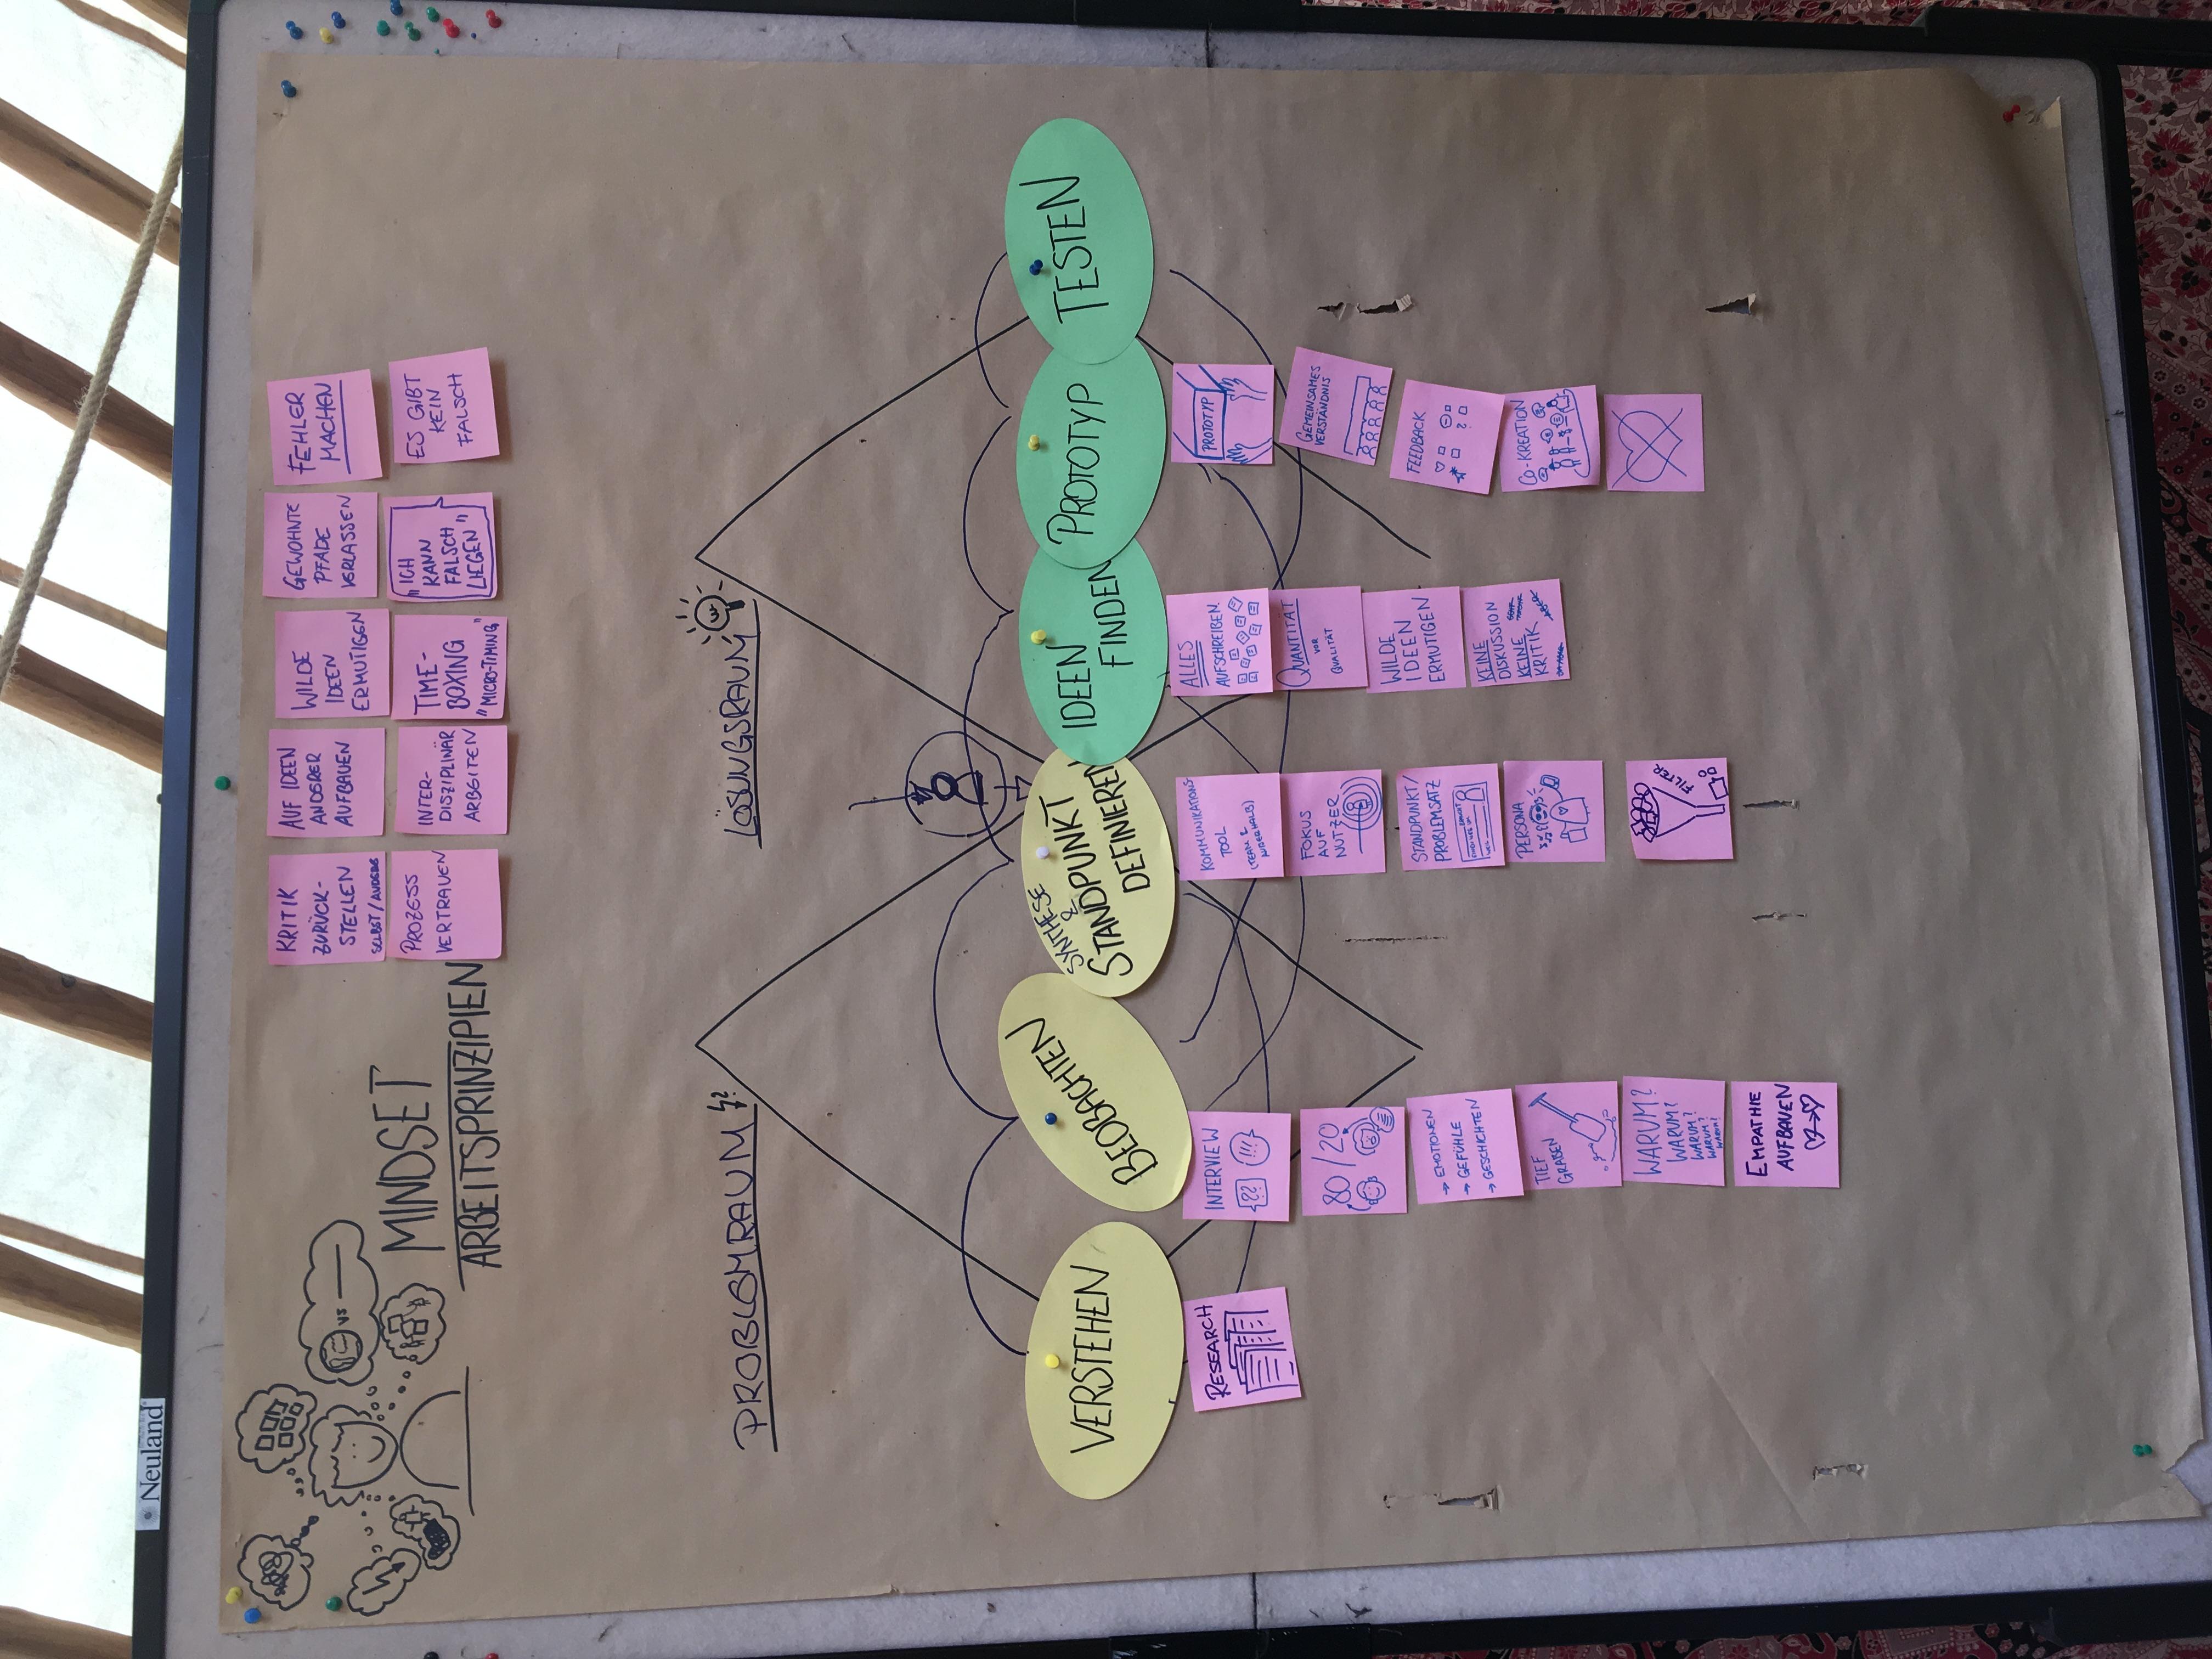 Design Thinking Teaser